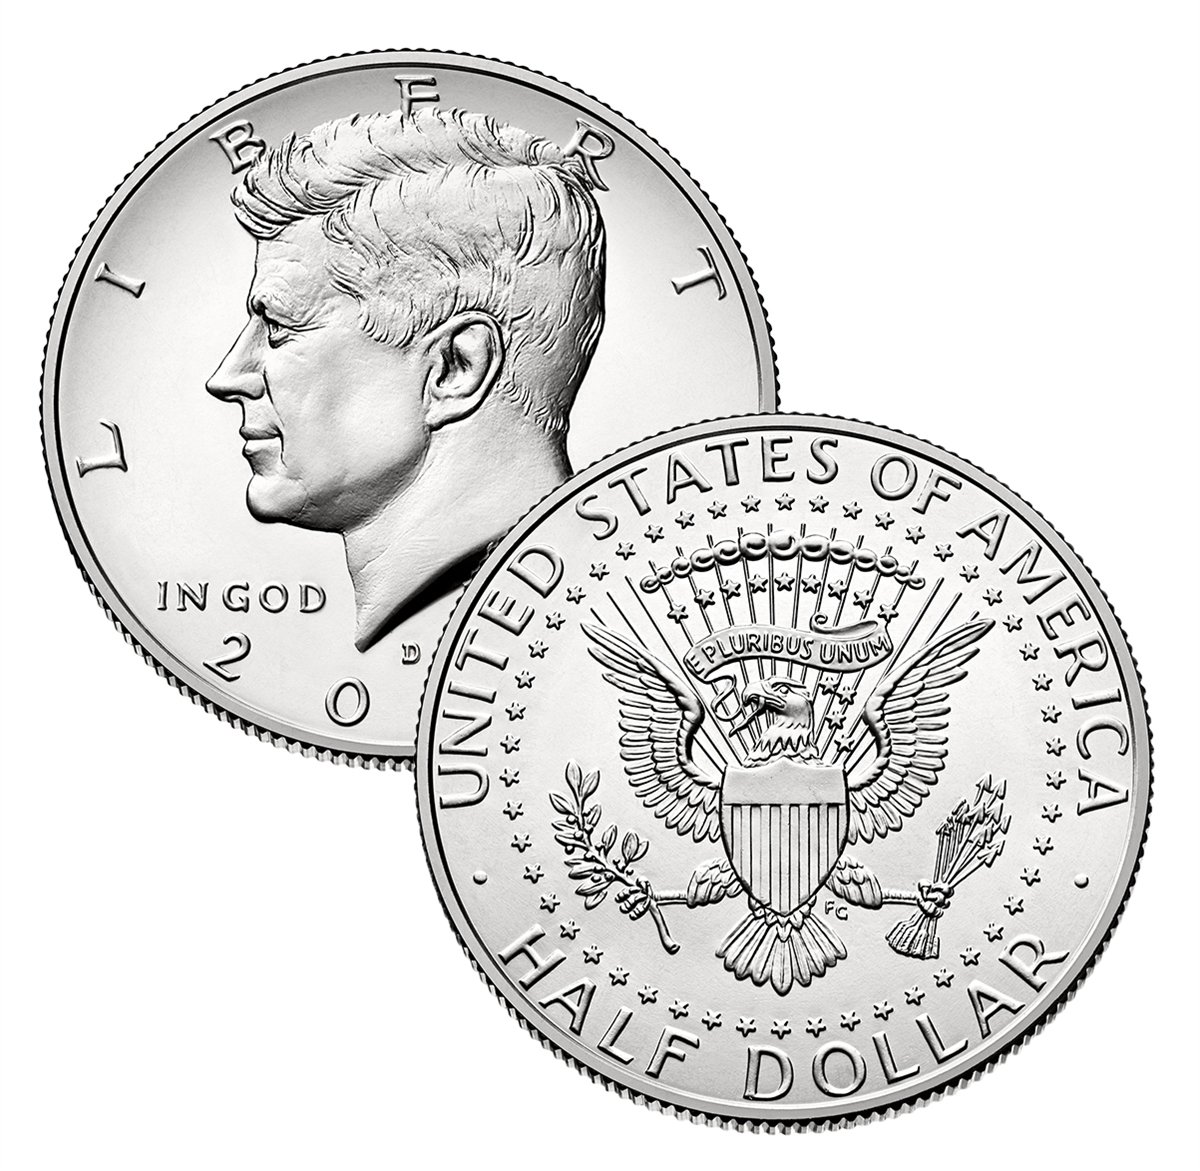 2007 P Kennedy Half Dollar Single Coin Half Dollar Uncirculated US Mint